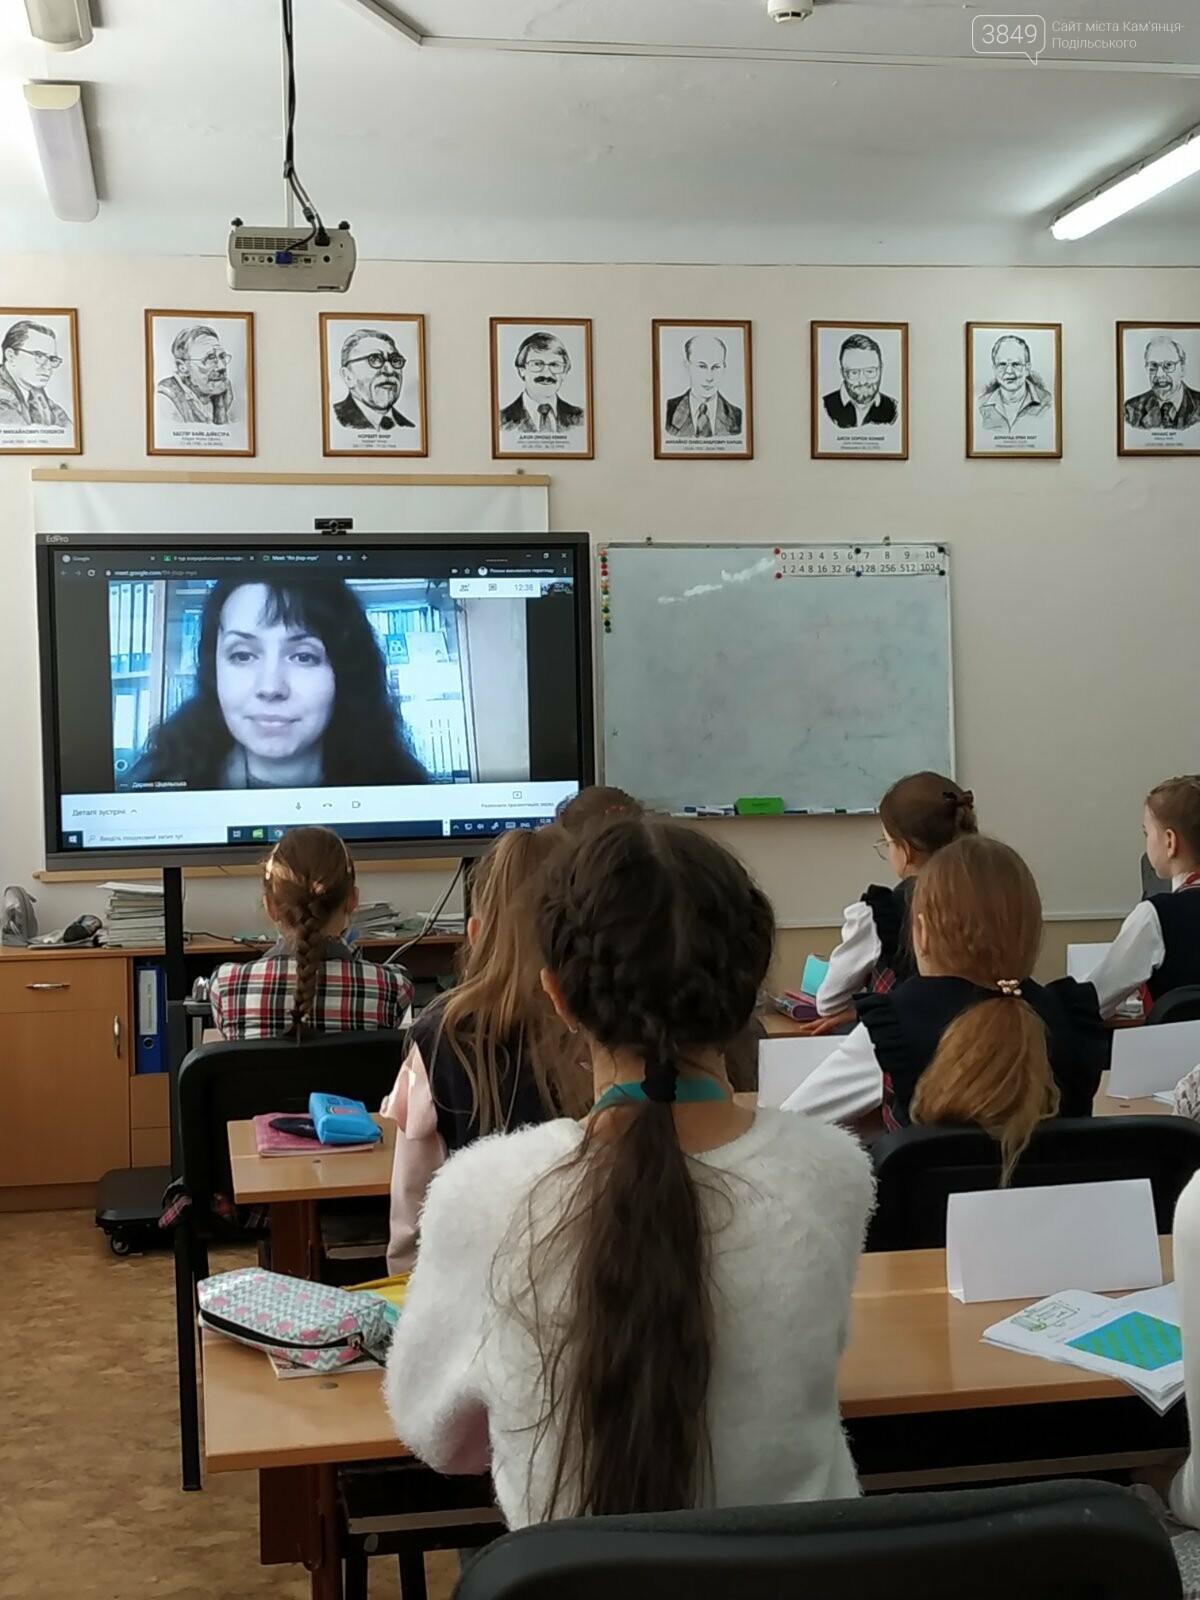 Дистанційний урок для учениць 5 класу школи м. Хмельницький